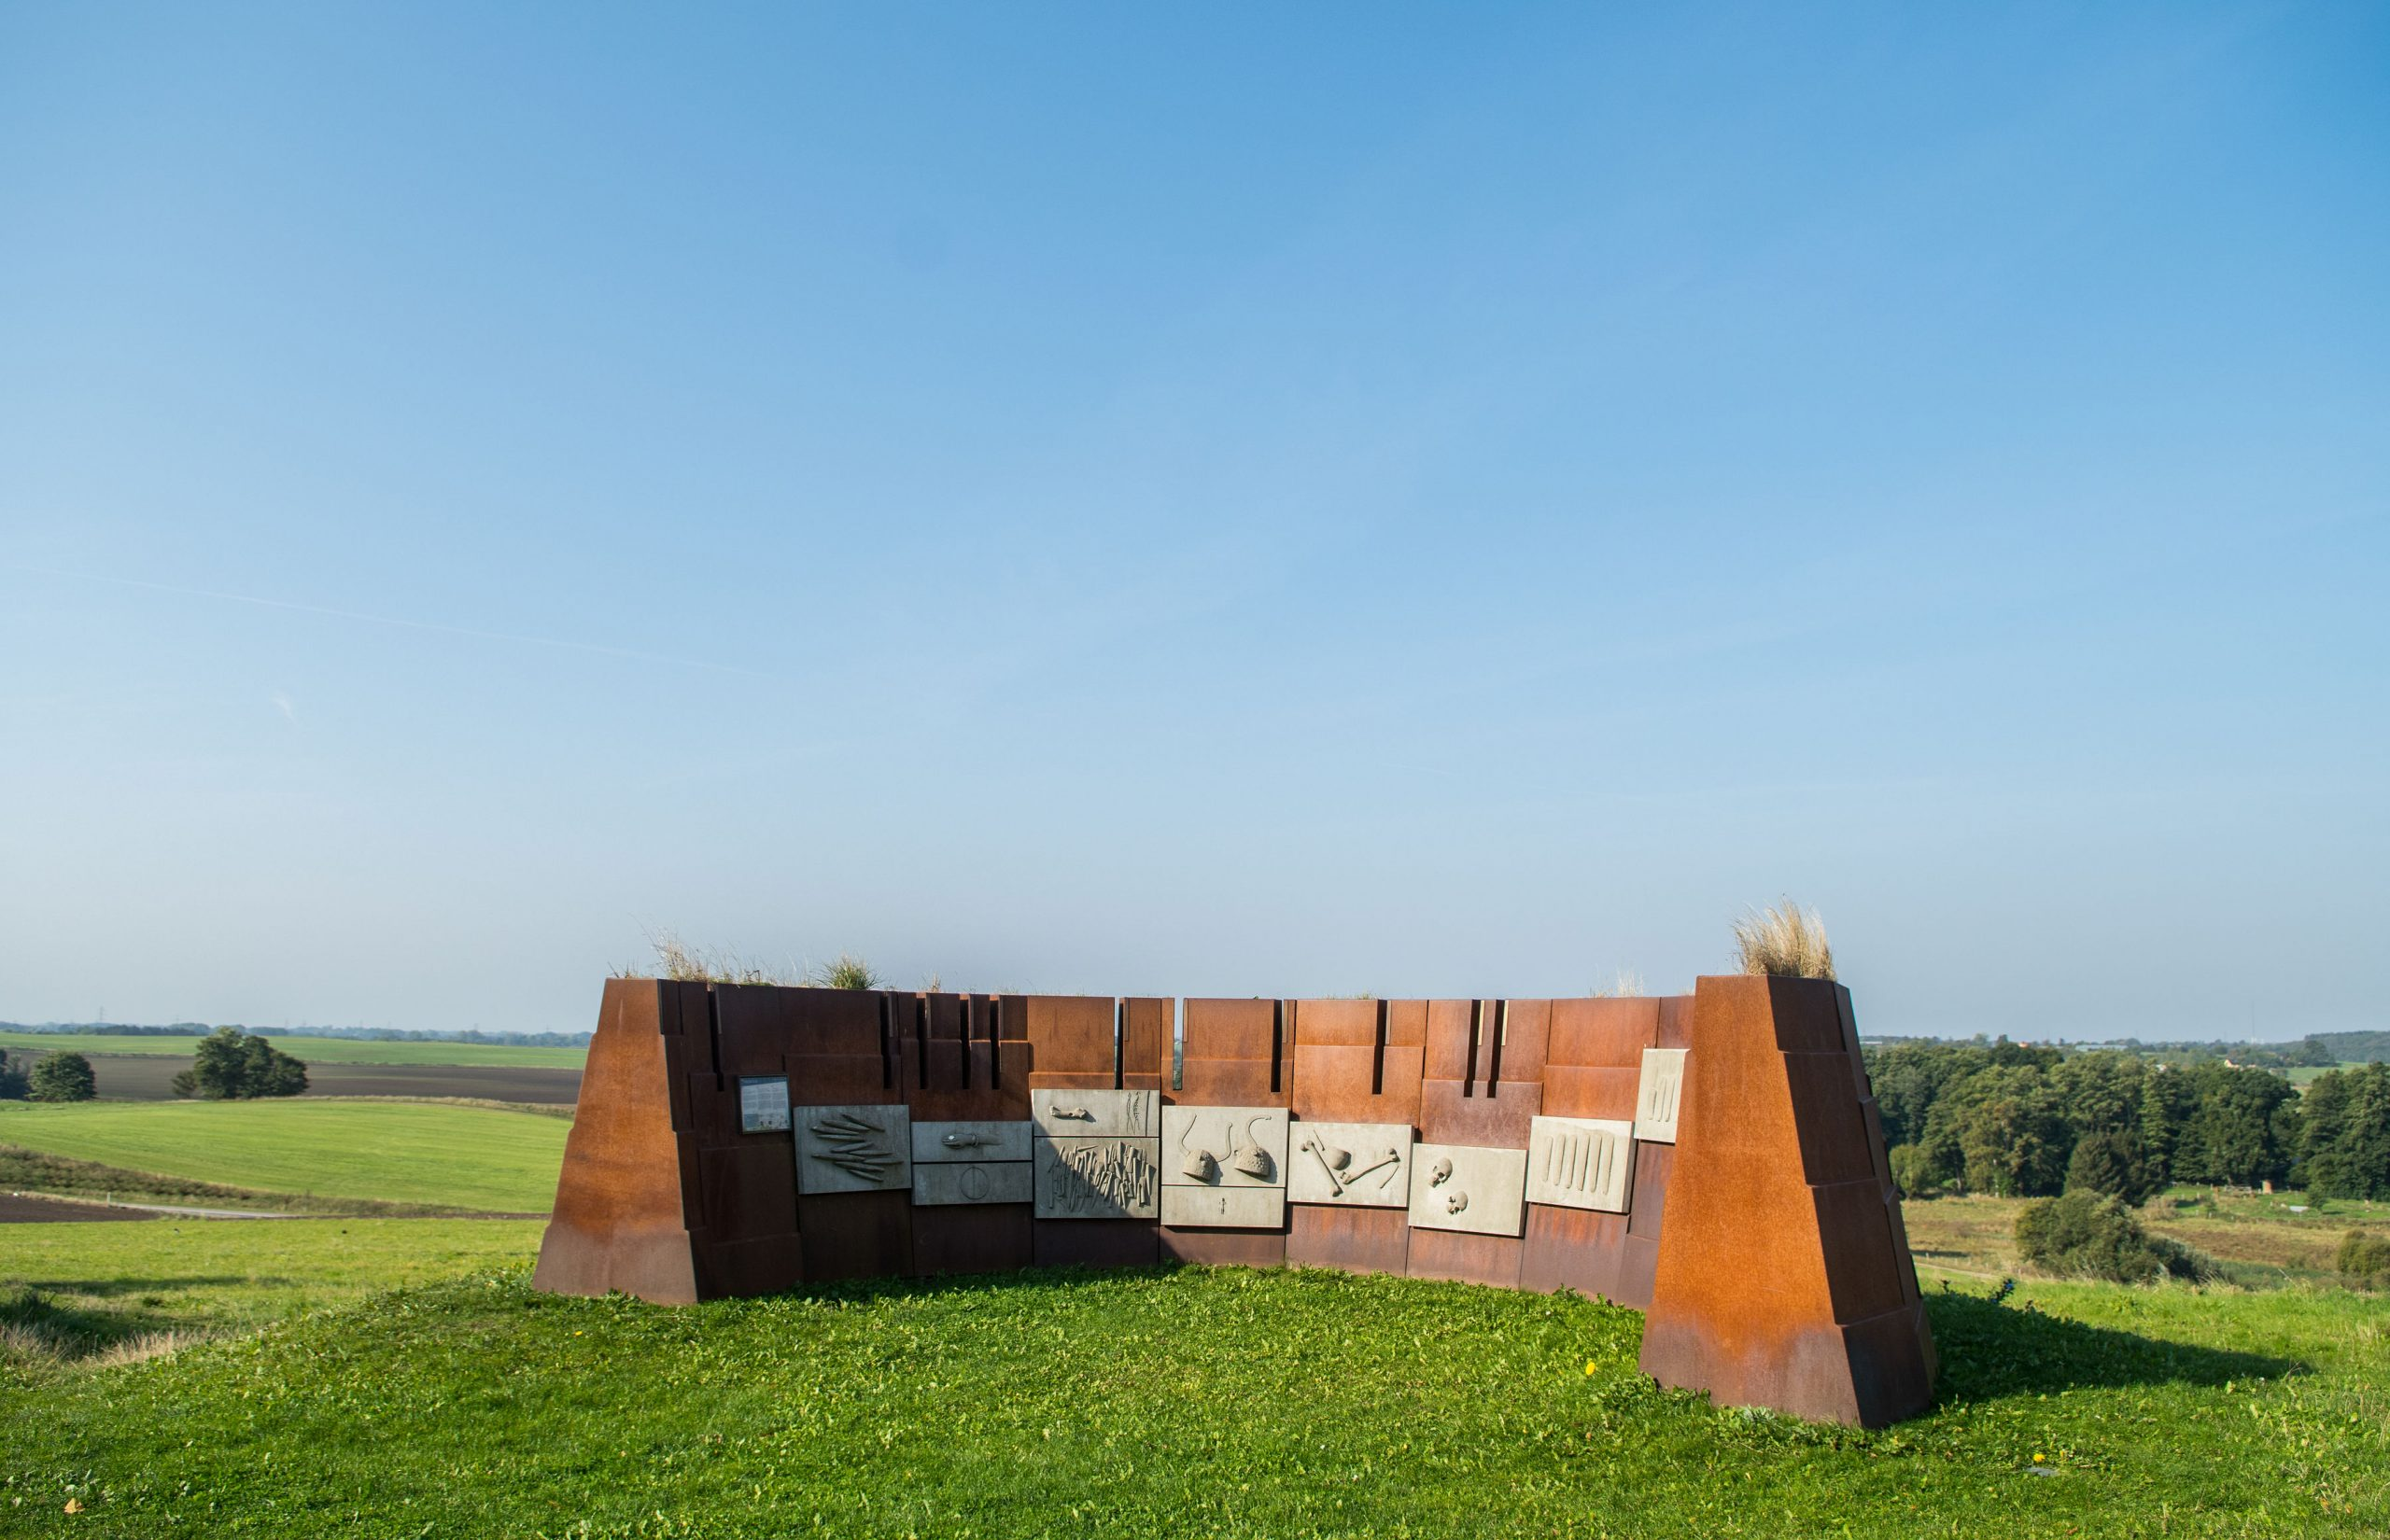 Panoptikon i Smørum – Værebro Ådals tusindårige historie